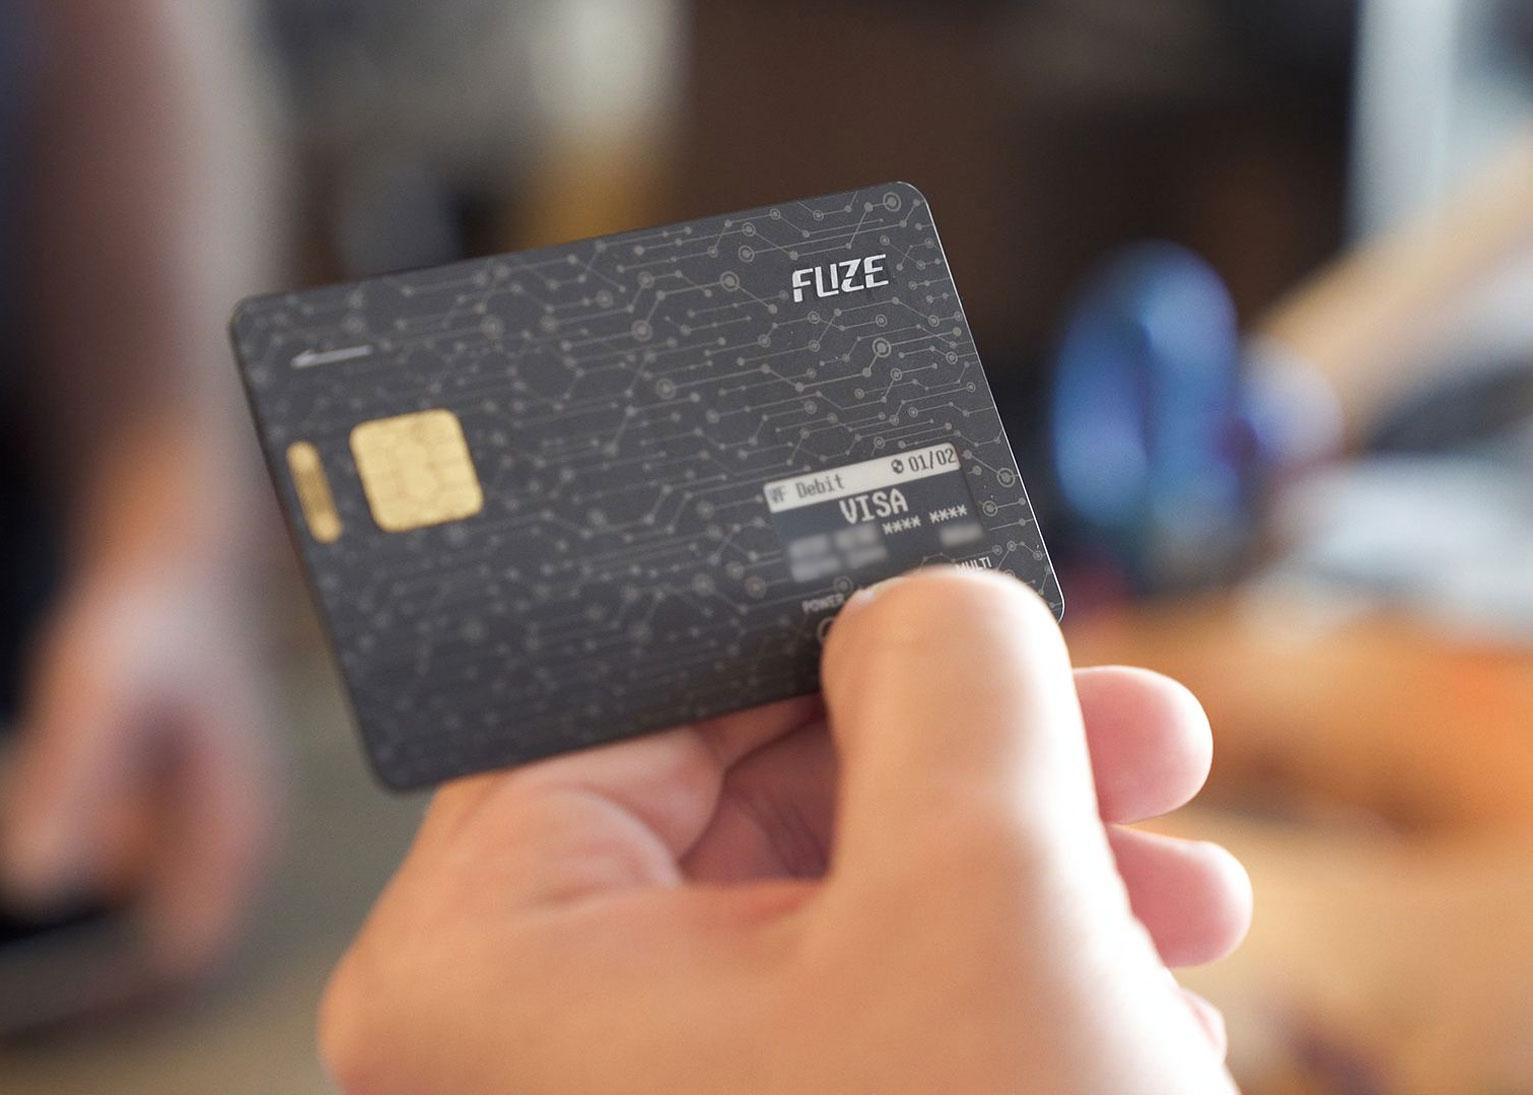 iReviews-fuze-smart-card_2.jpg